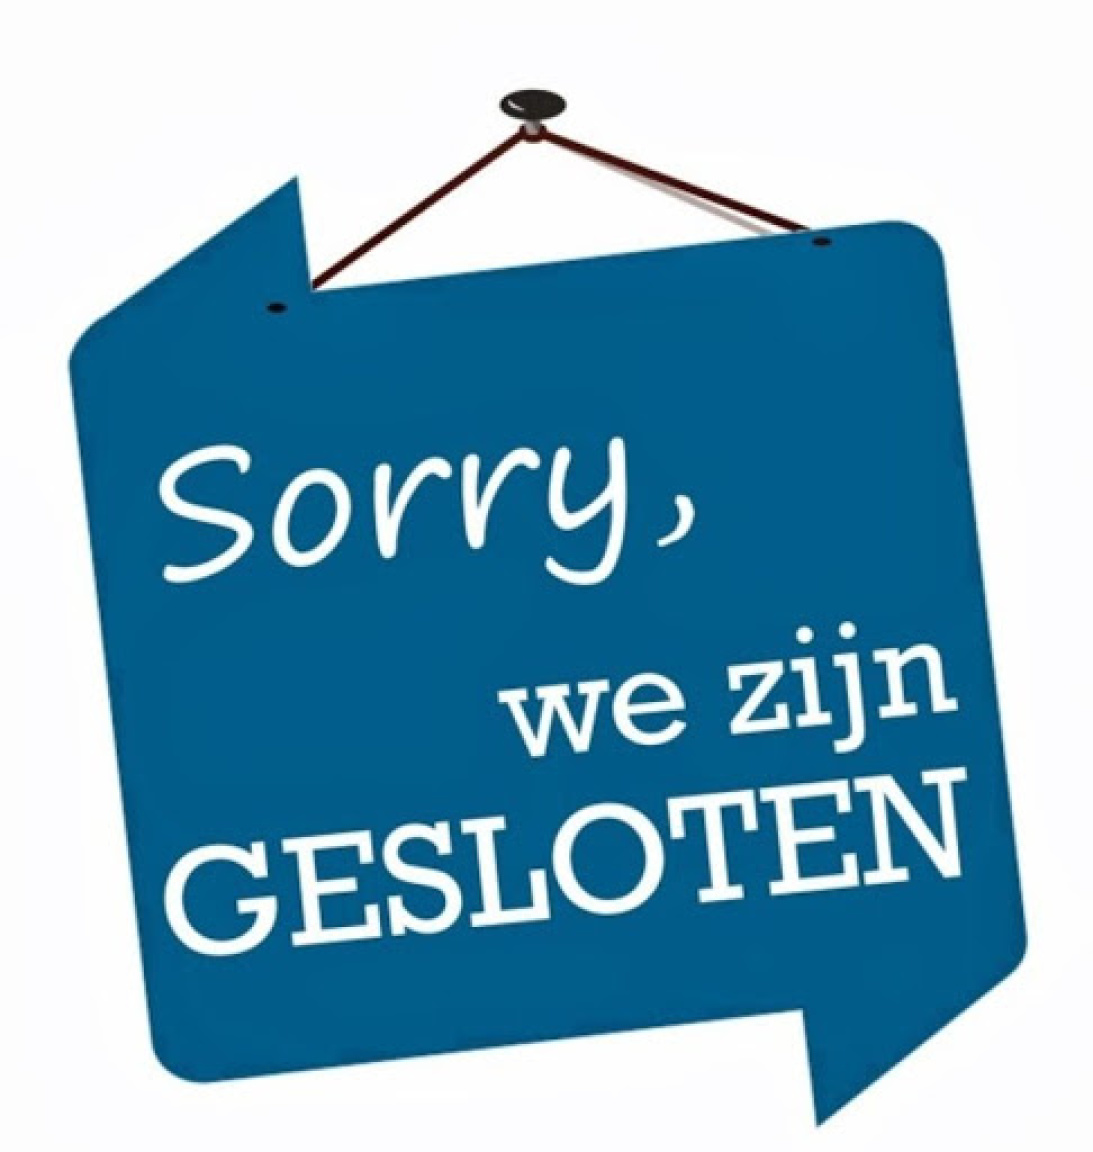 Zaterdag gesloten-2020-10-09 17:10:59